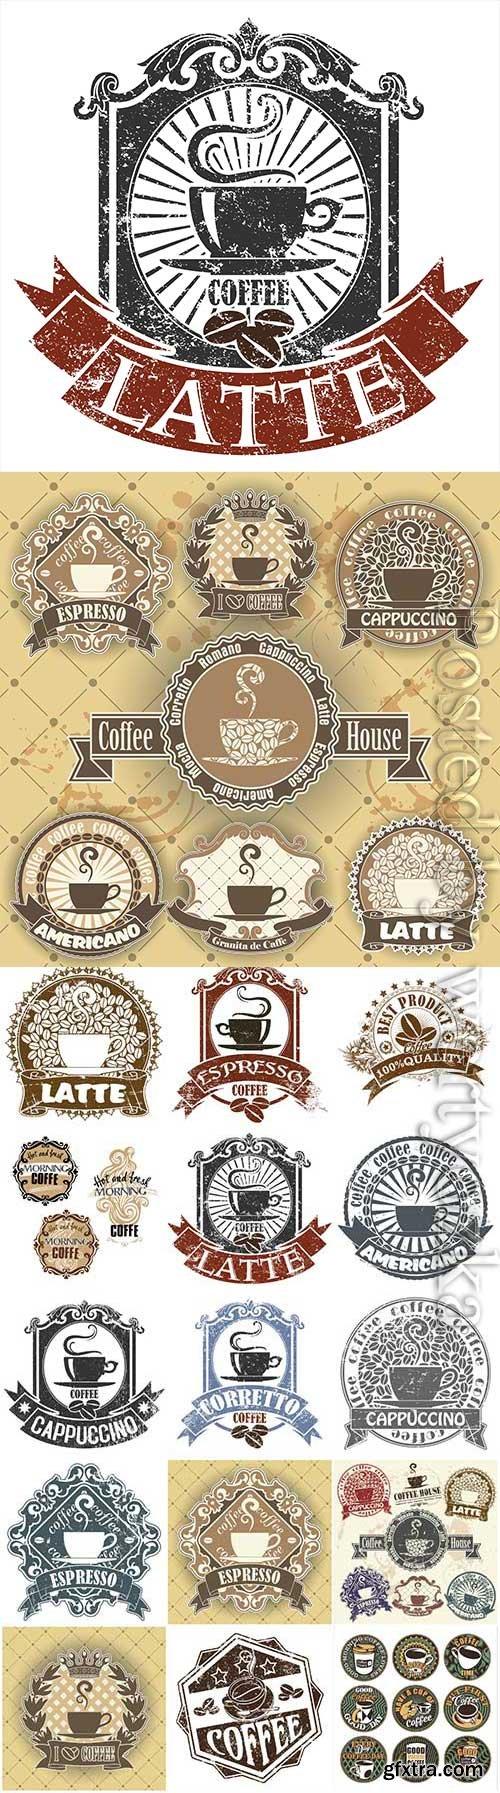 Retro coffee labels in vector